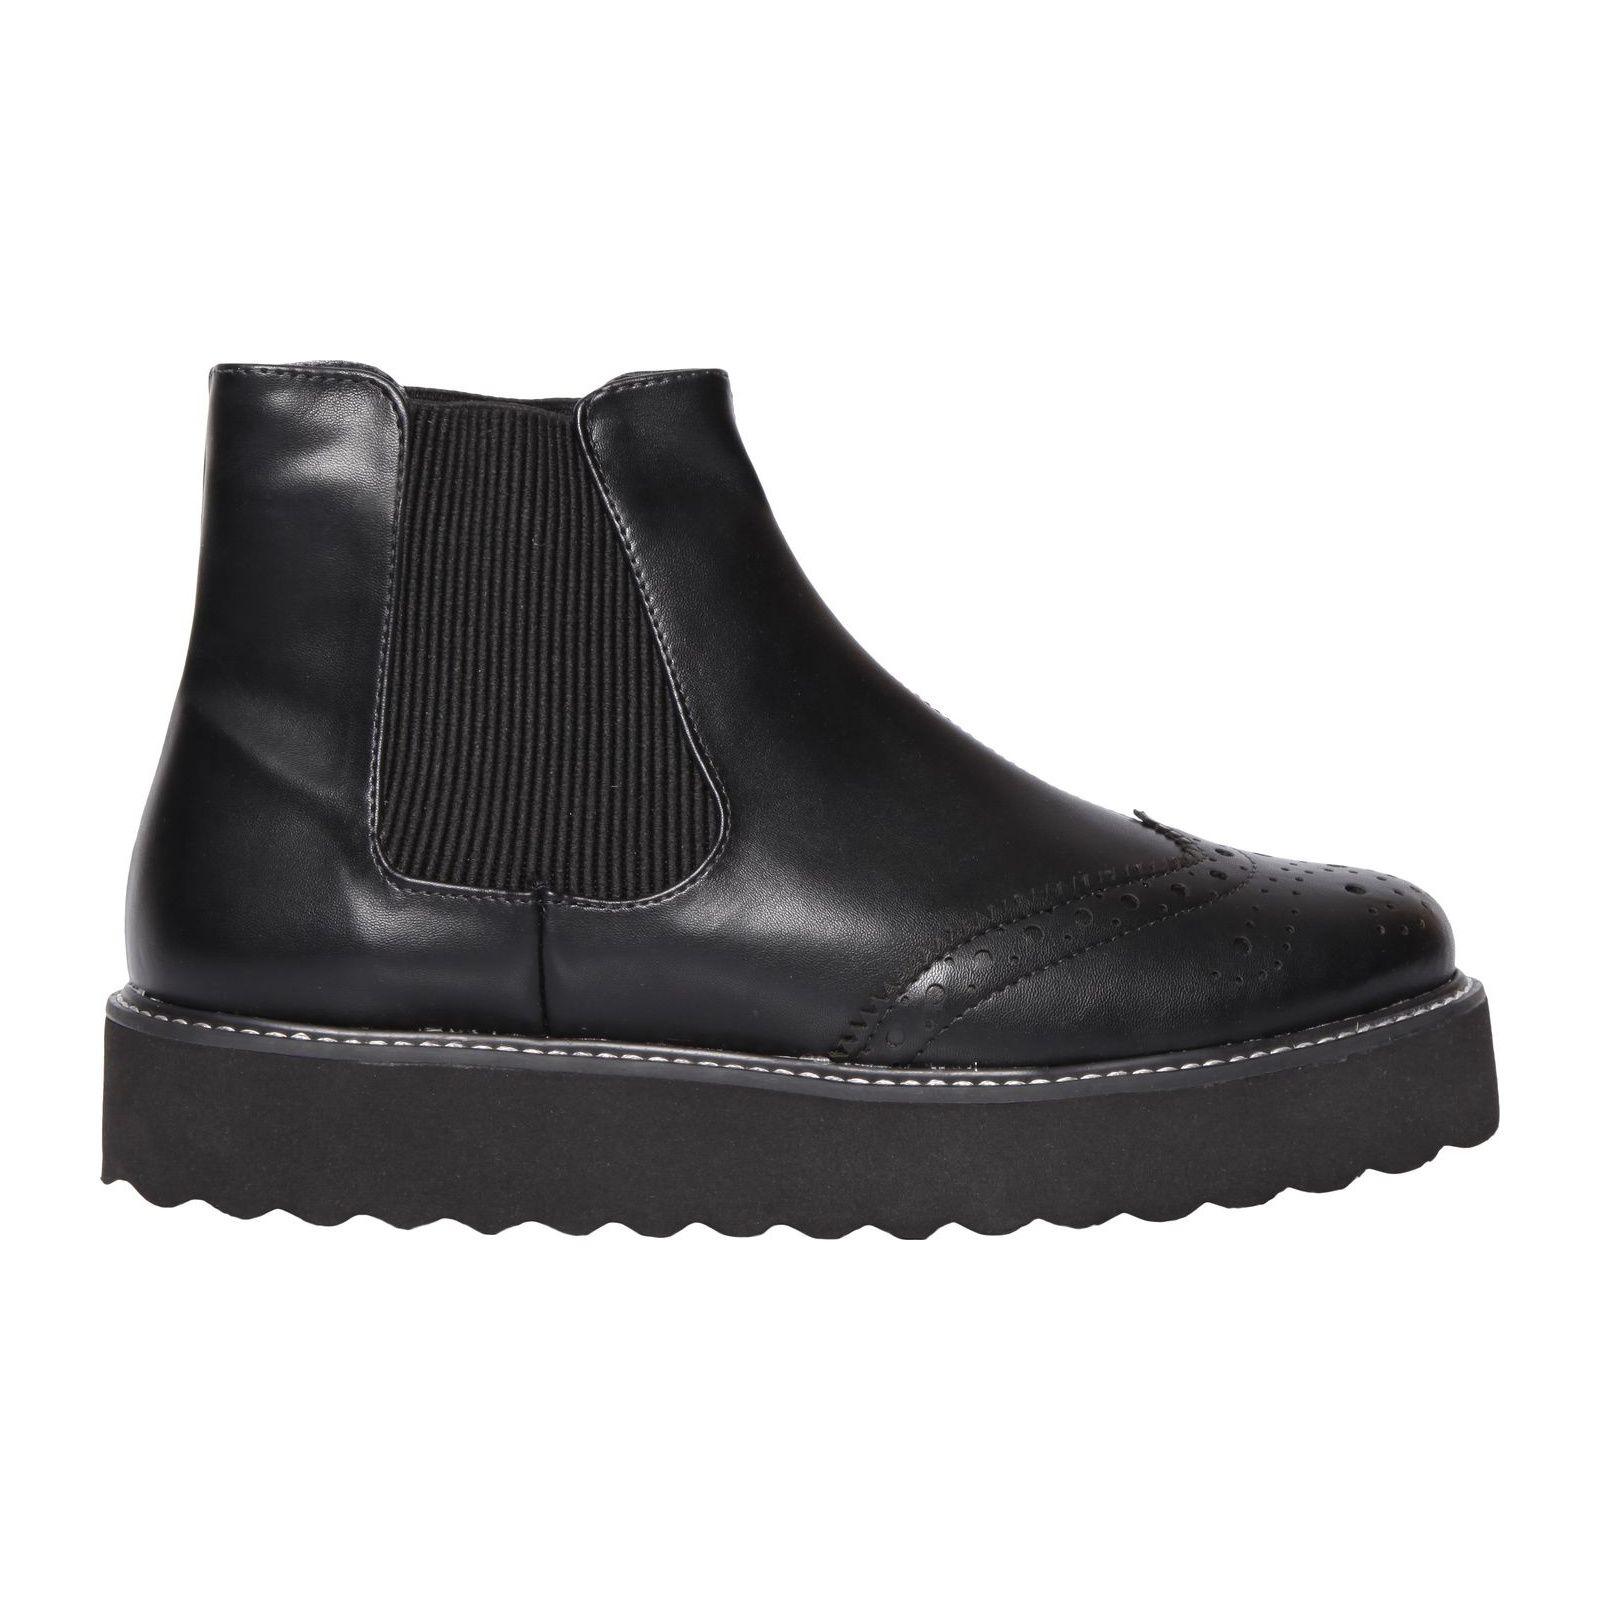 Chelsea Boot Flatform Oxford - Preta